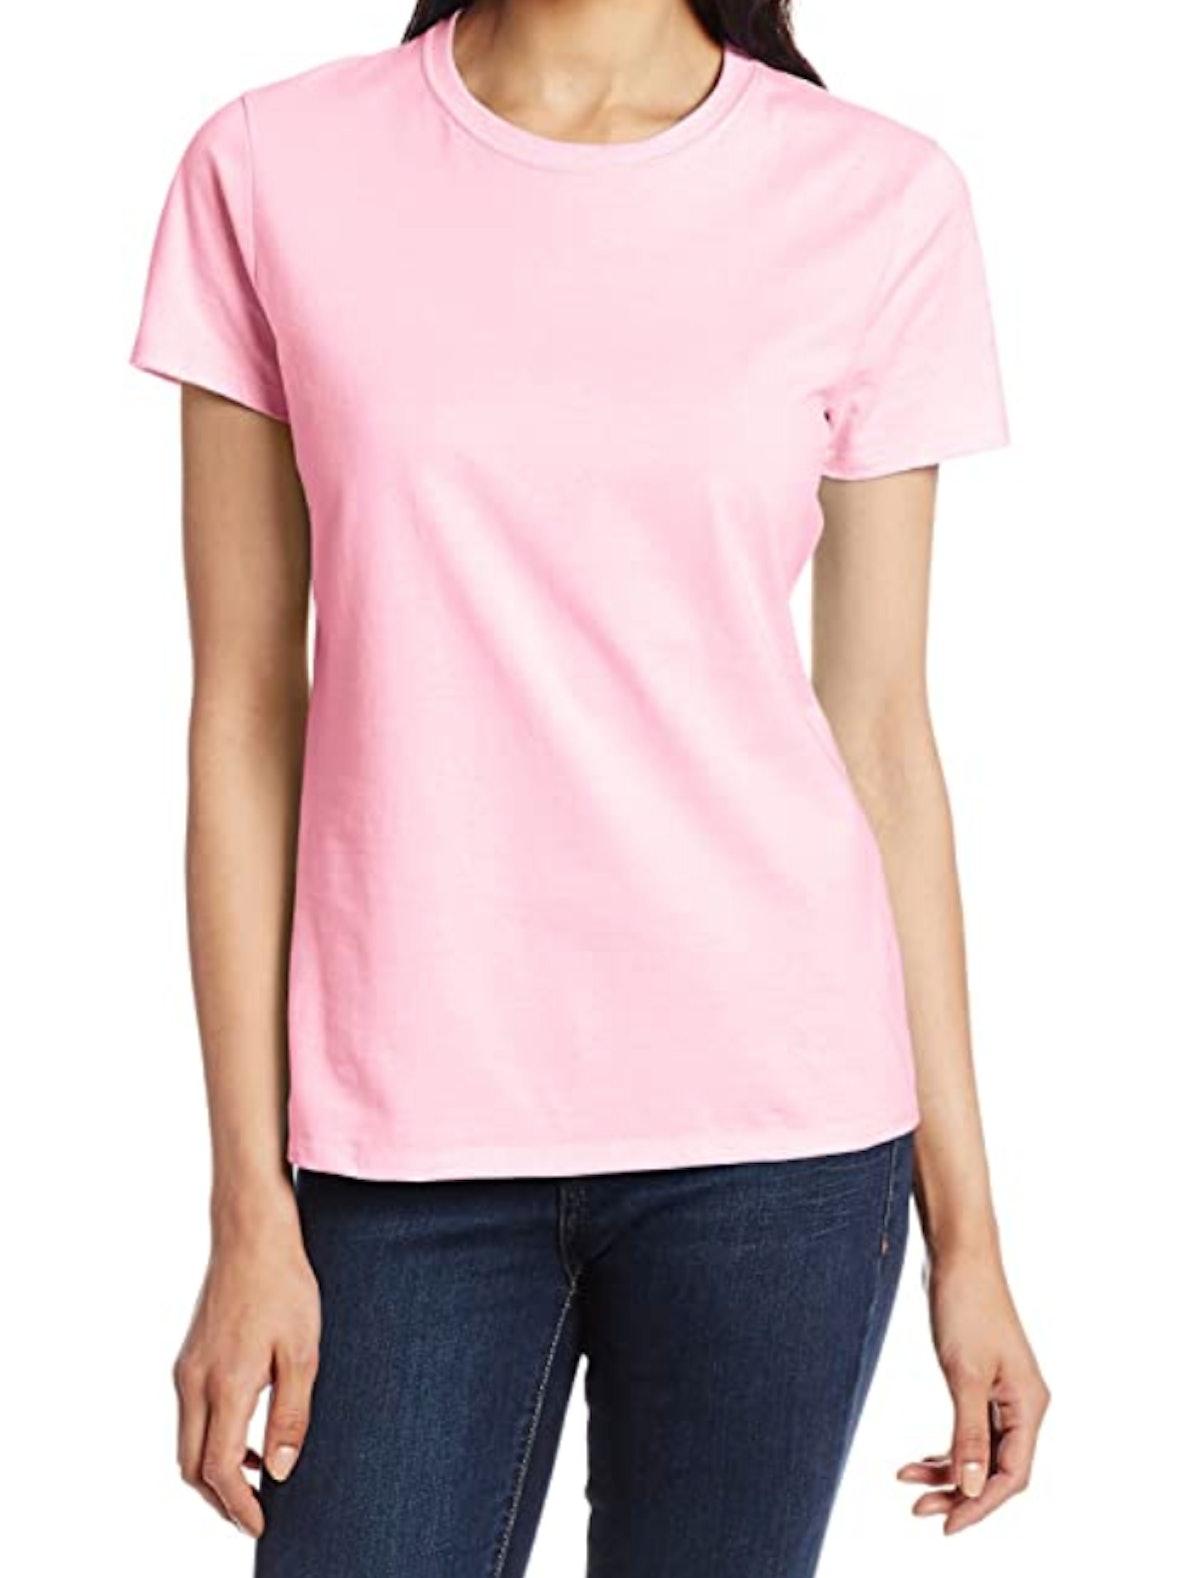 Pale Pink Hanes Nano T-Shirt